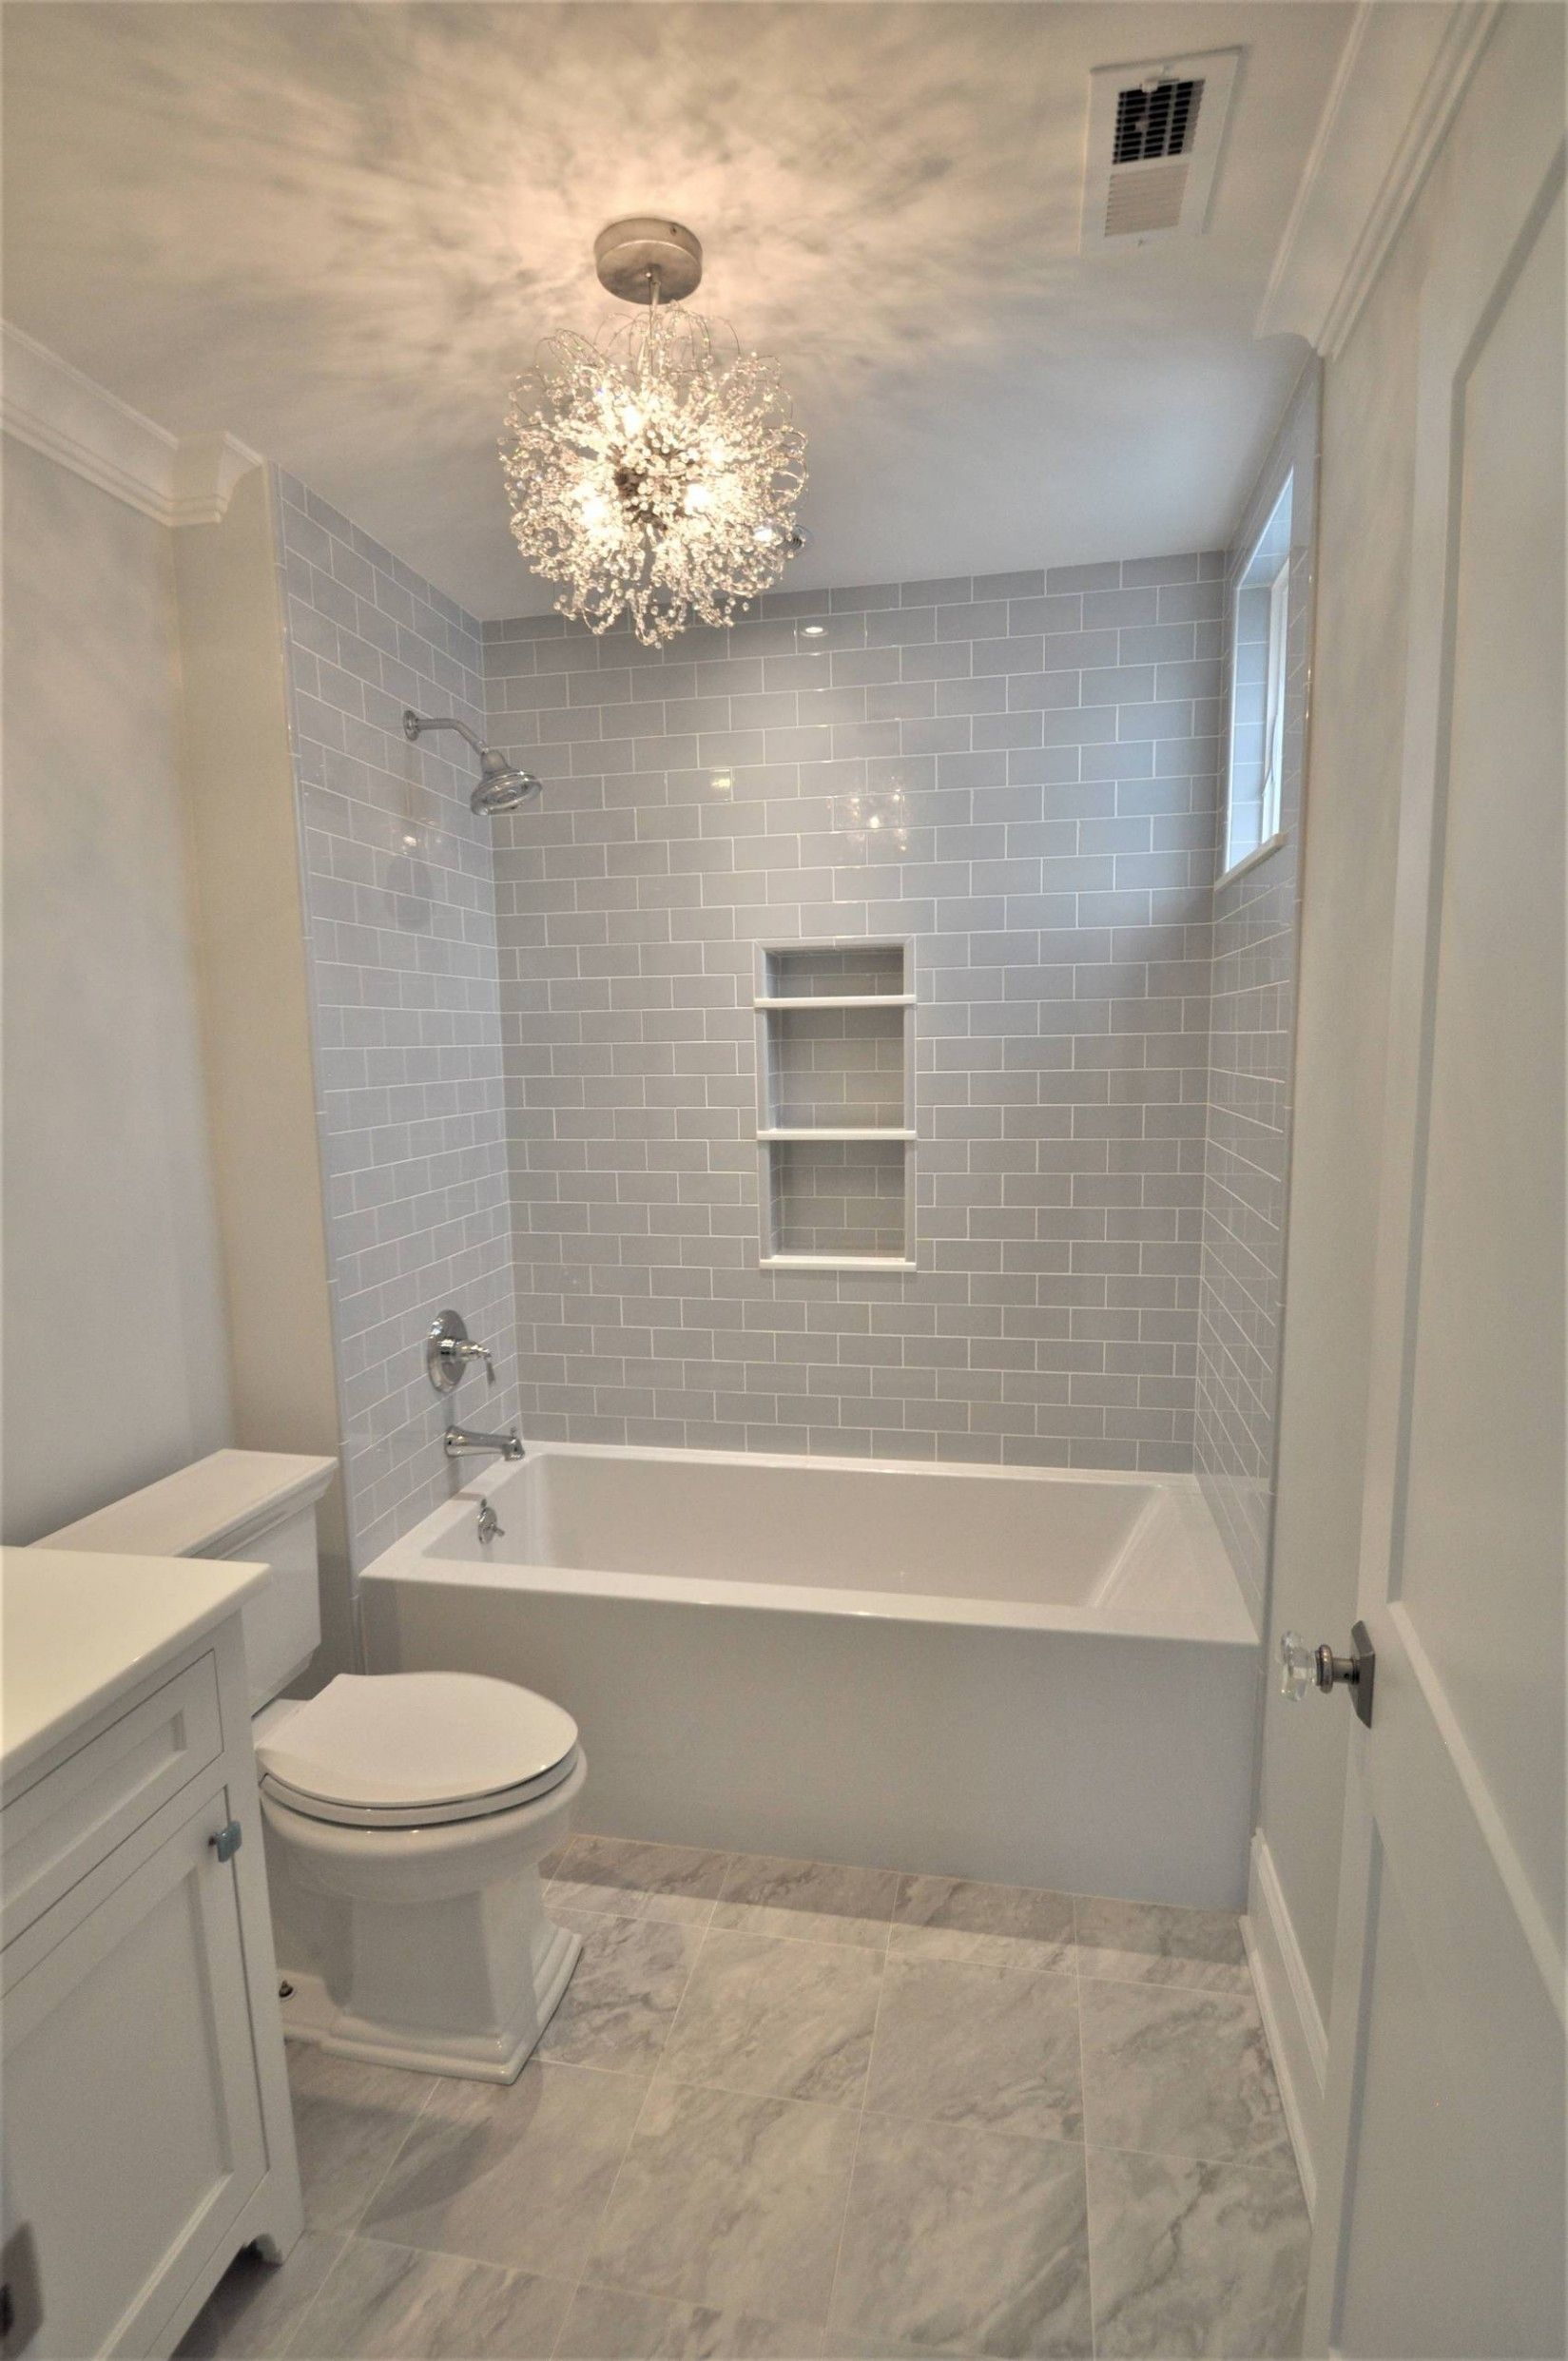 Show Me Small Bathroom in 2020   Bathroom design small ... on Small Bathroom Ideas 2020 id=38339